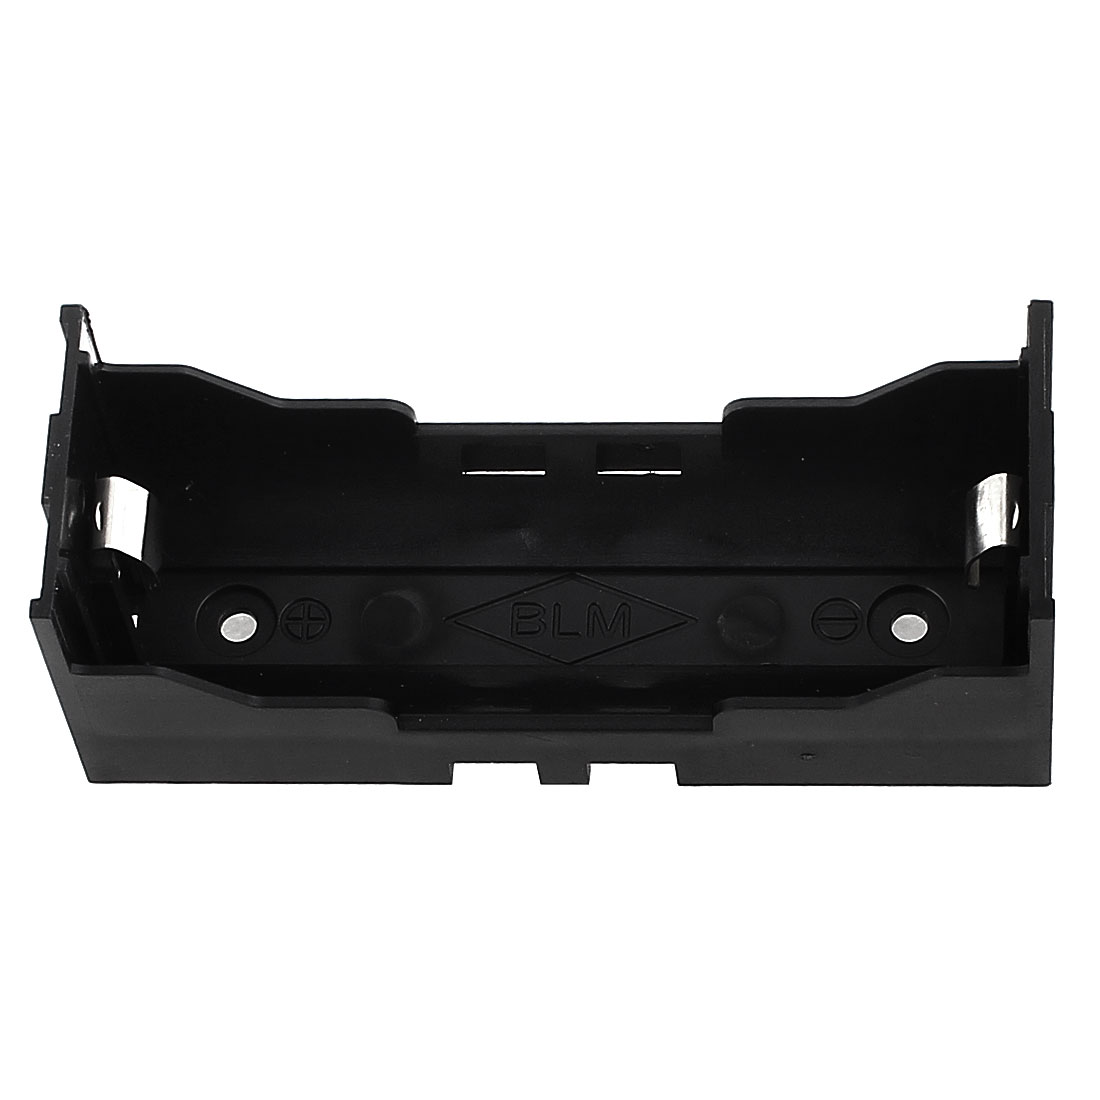 Plastic Single 26650 Battery Holder Case Storage Box Black